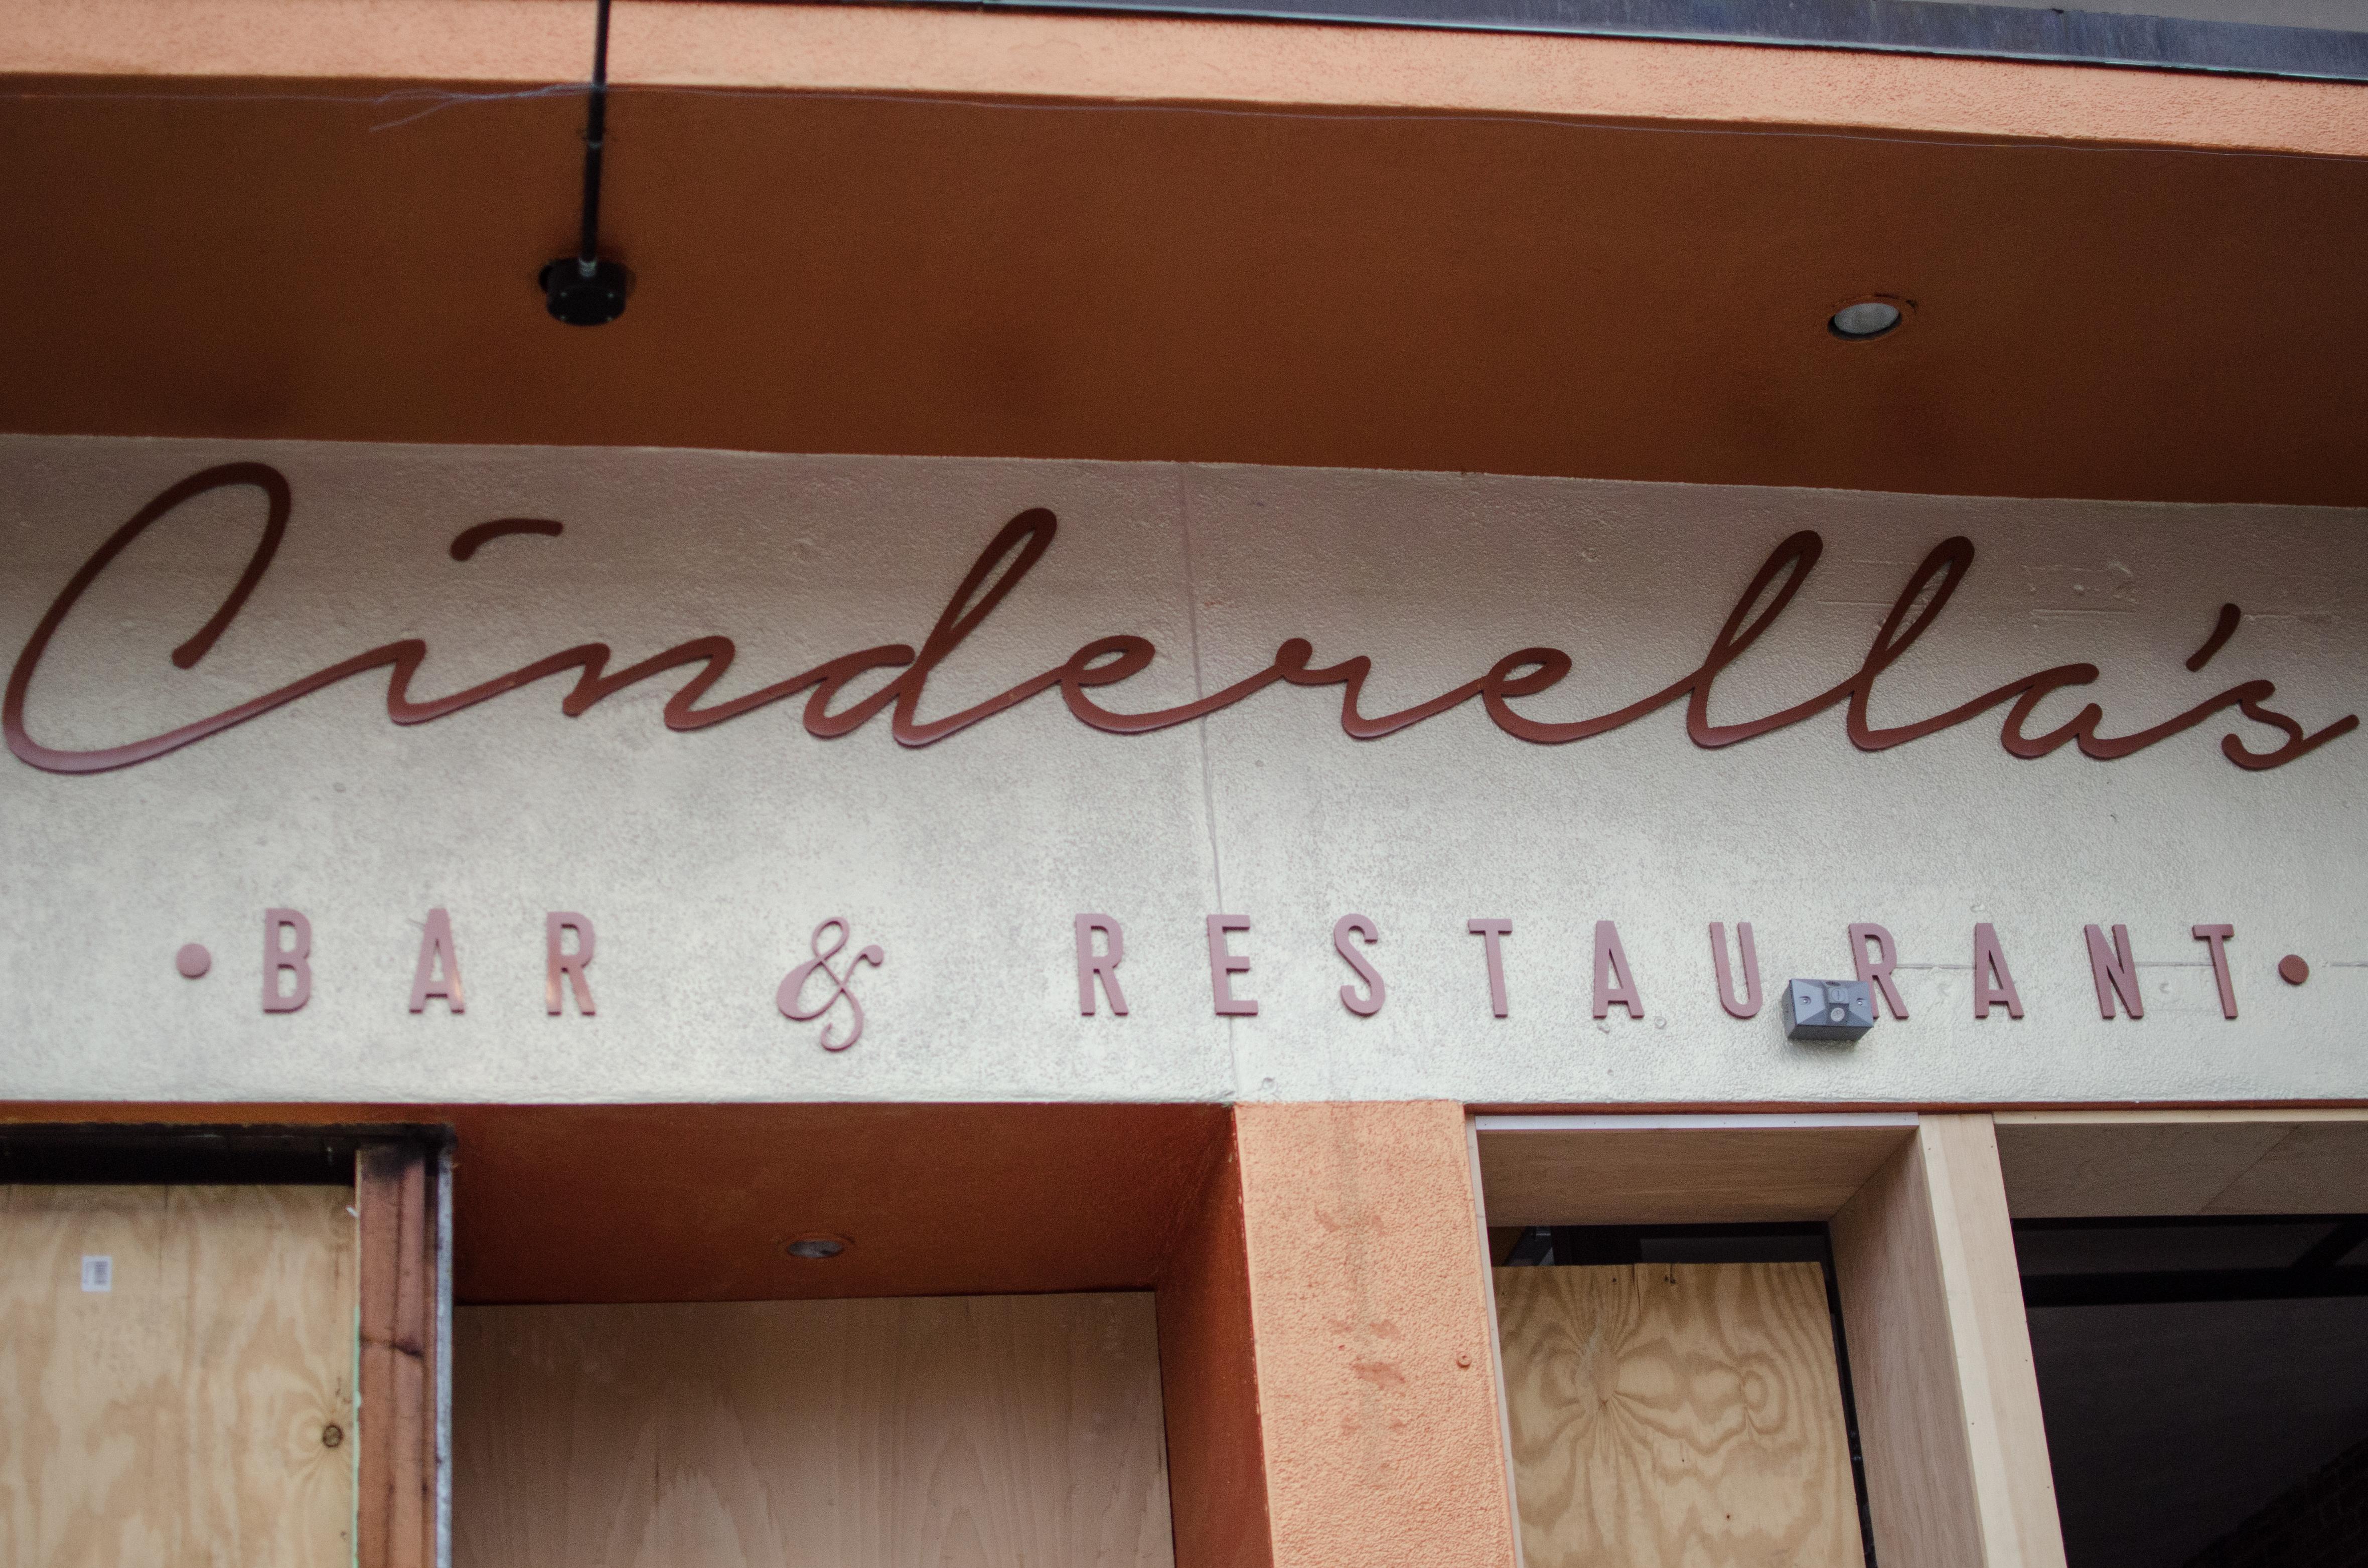 New signage at Cinderella's.